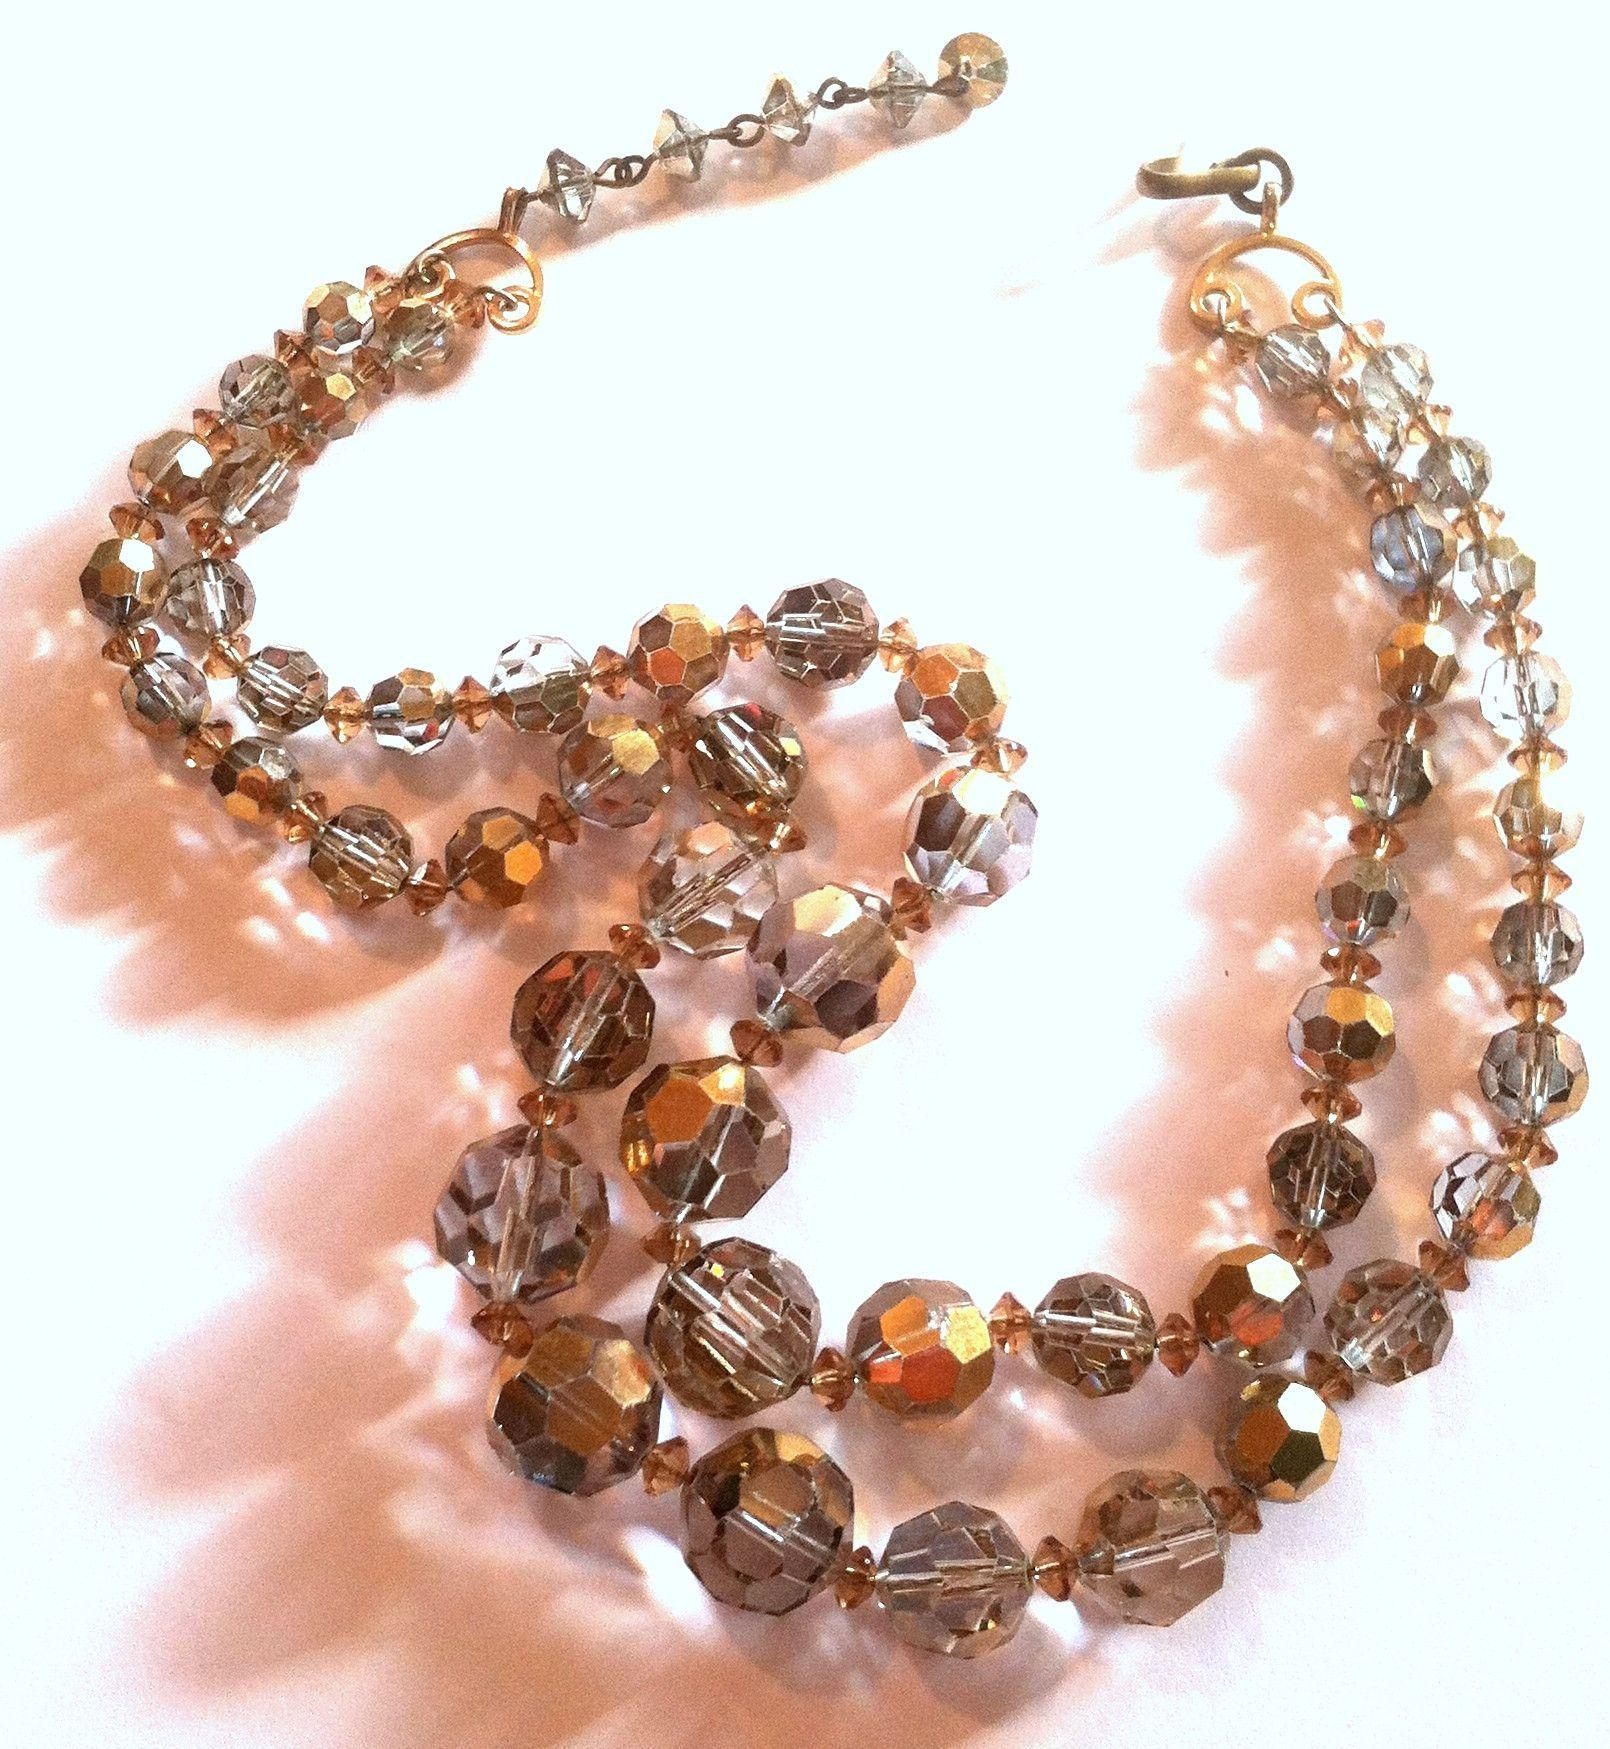 Shimmering Gold and Silver Aurora Borealis Crystal Necklace circa 1960s